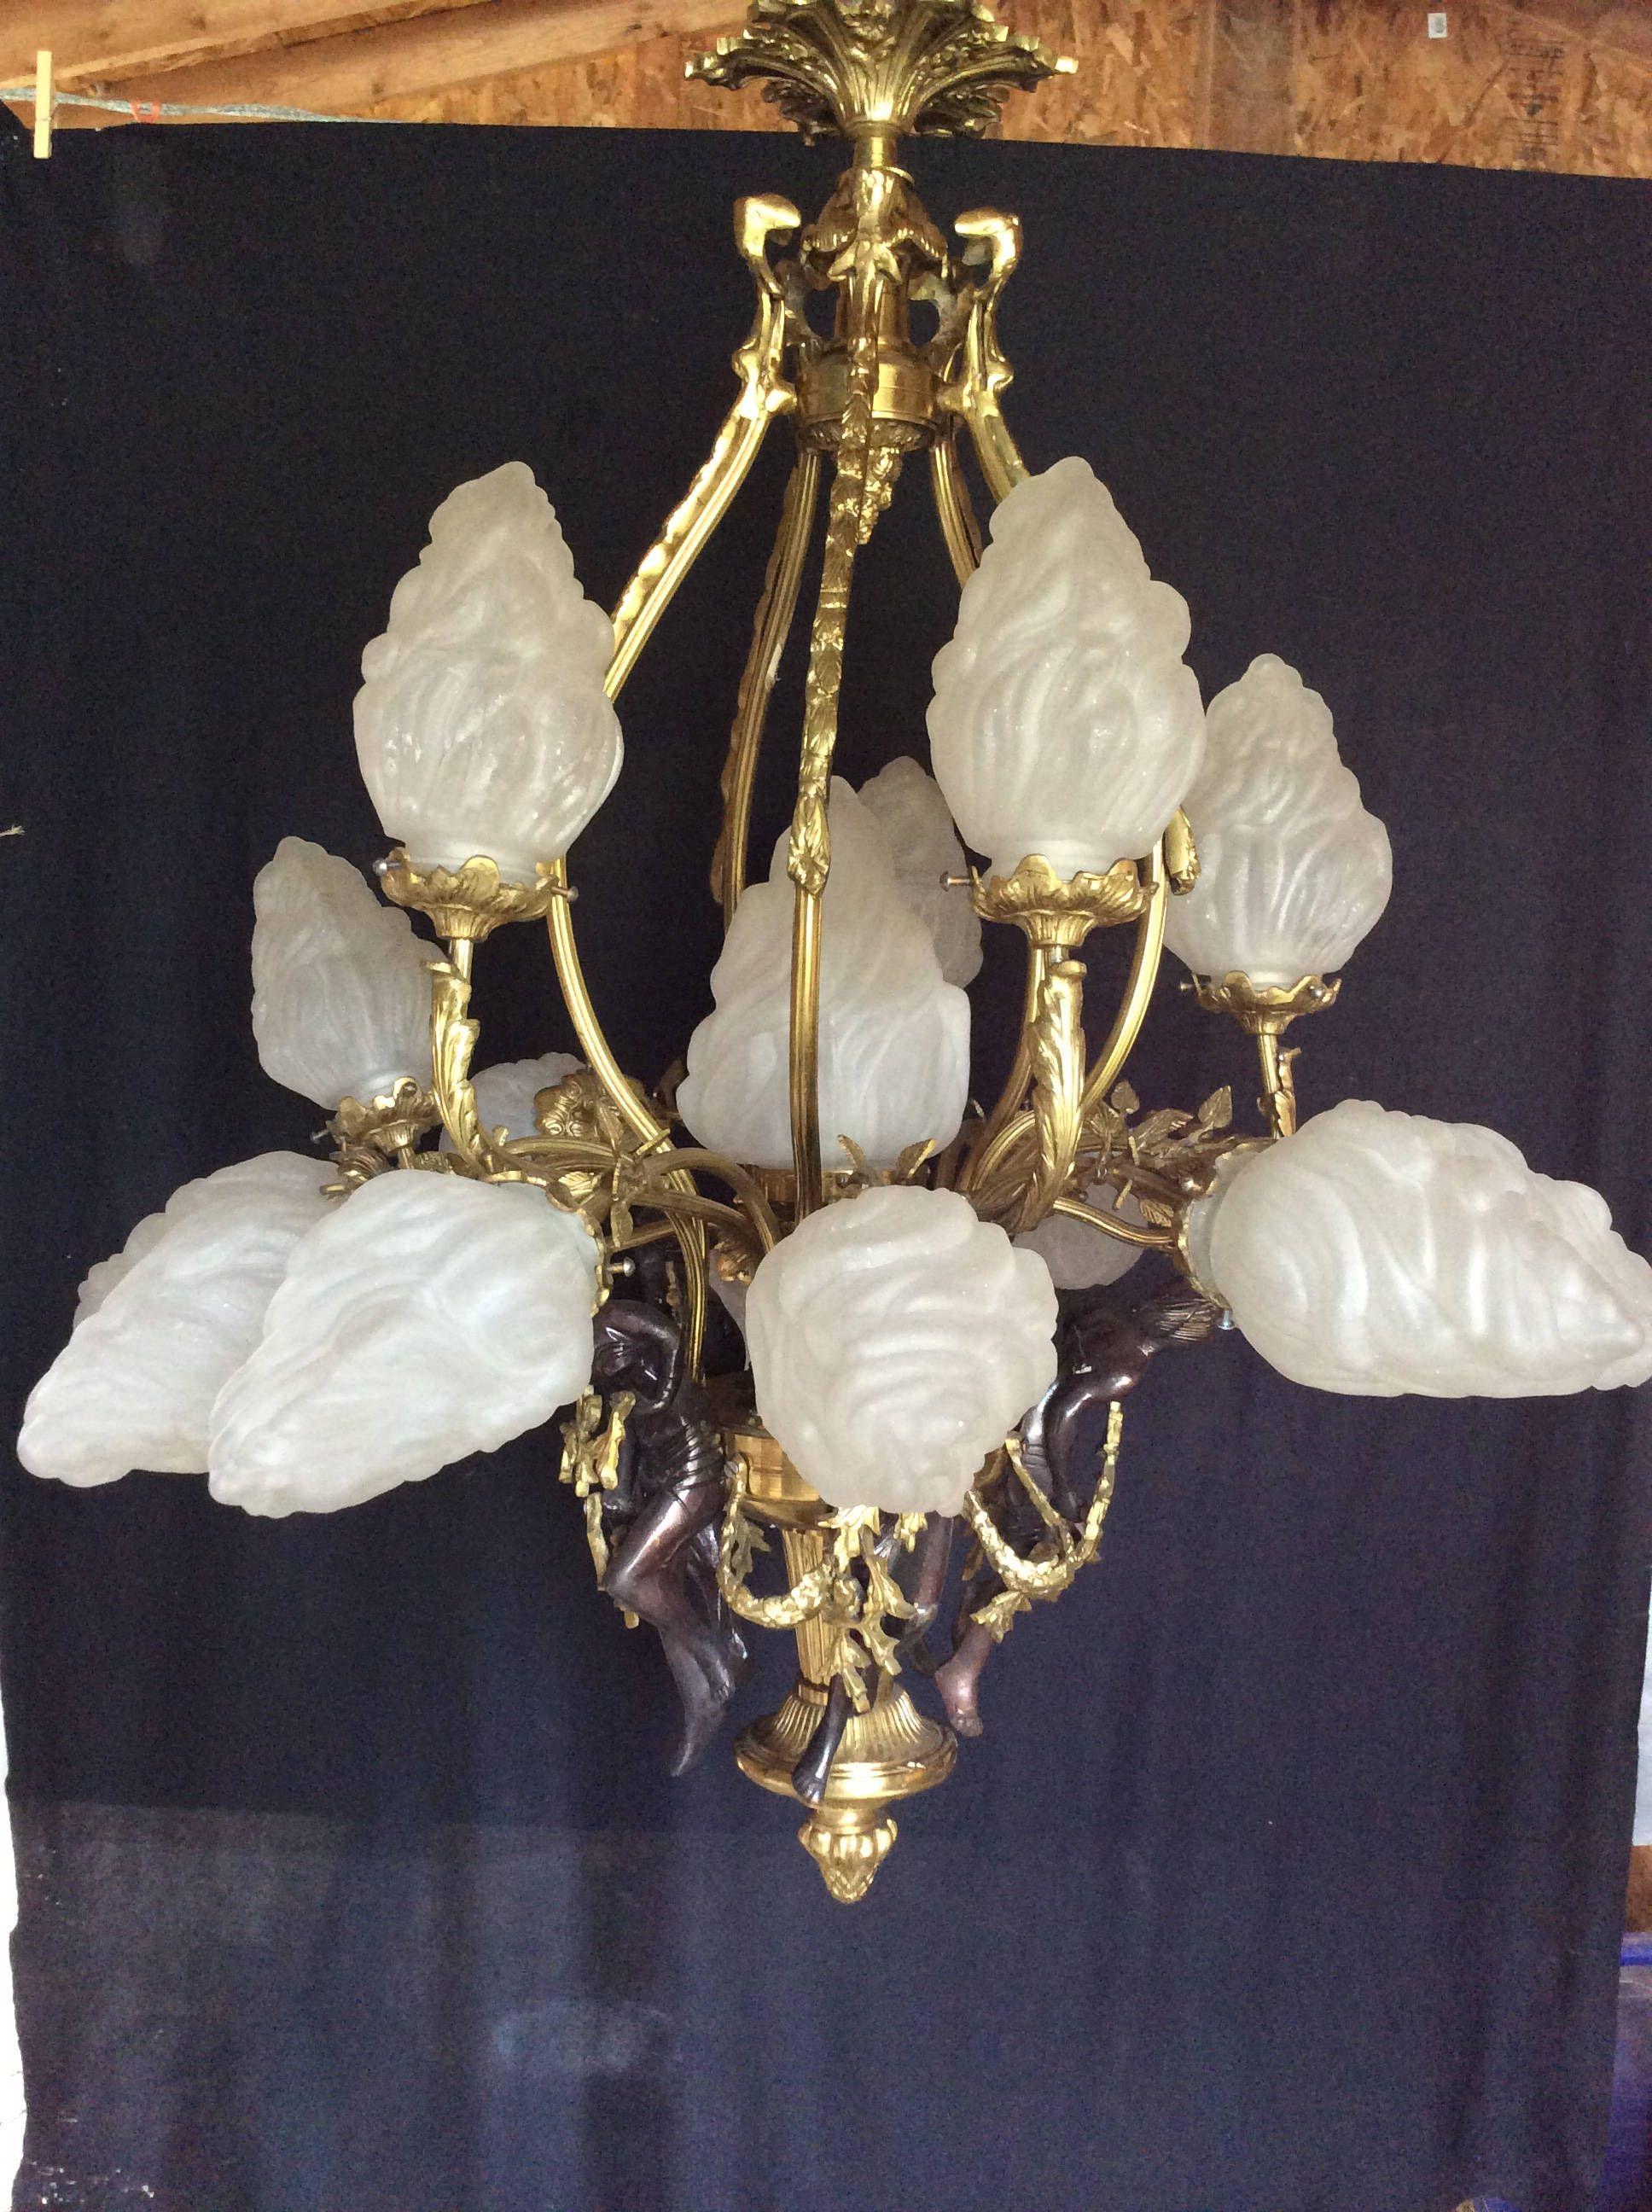 Huge Vintage French Chandelier 16 Stalactite Flame Shades 5 Bronze